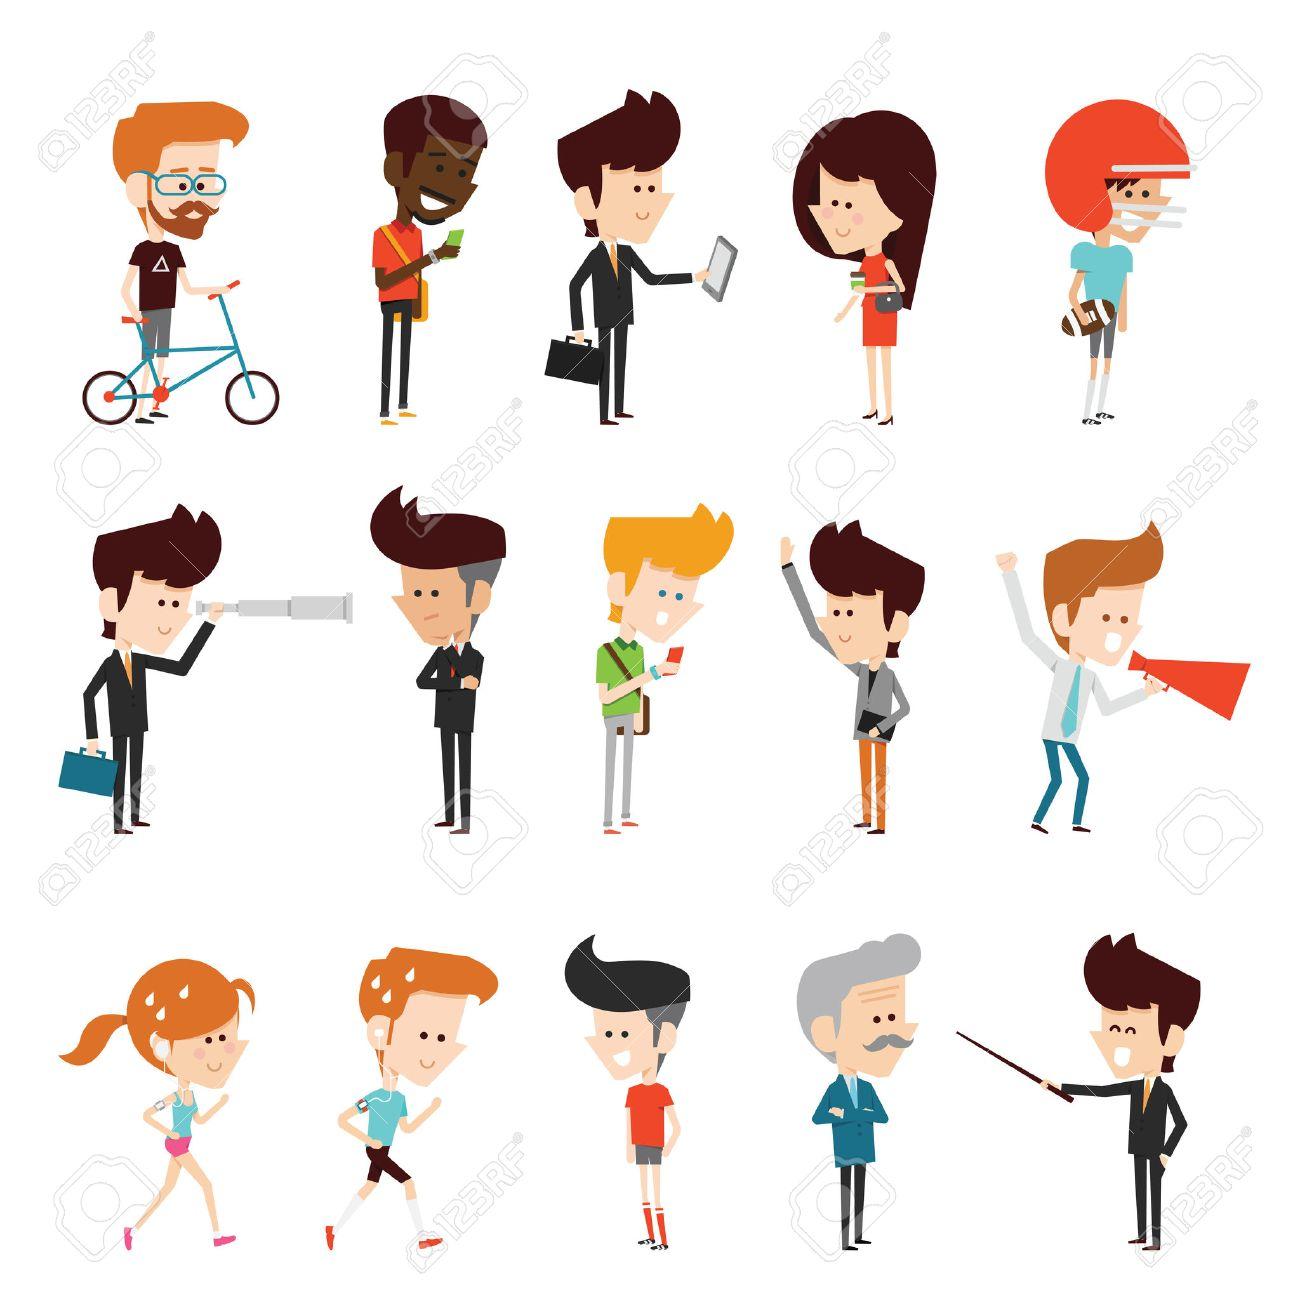 characters design flat cartoon Stock Vector - 45916960